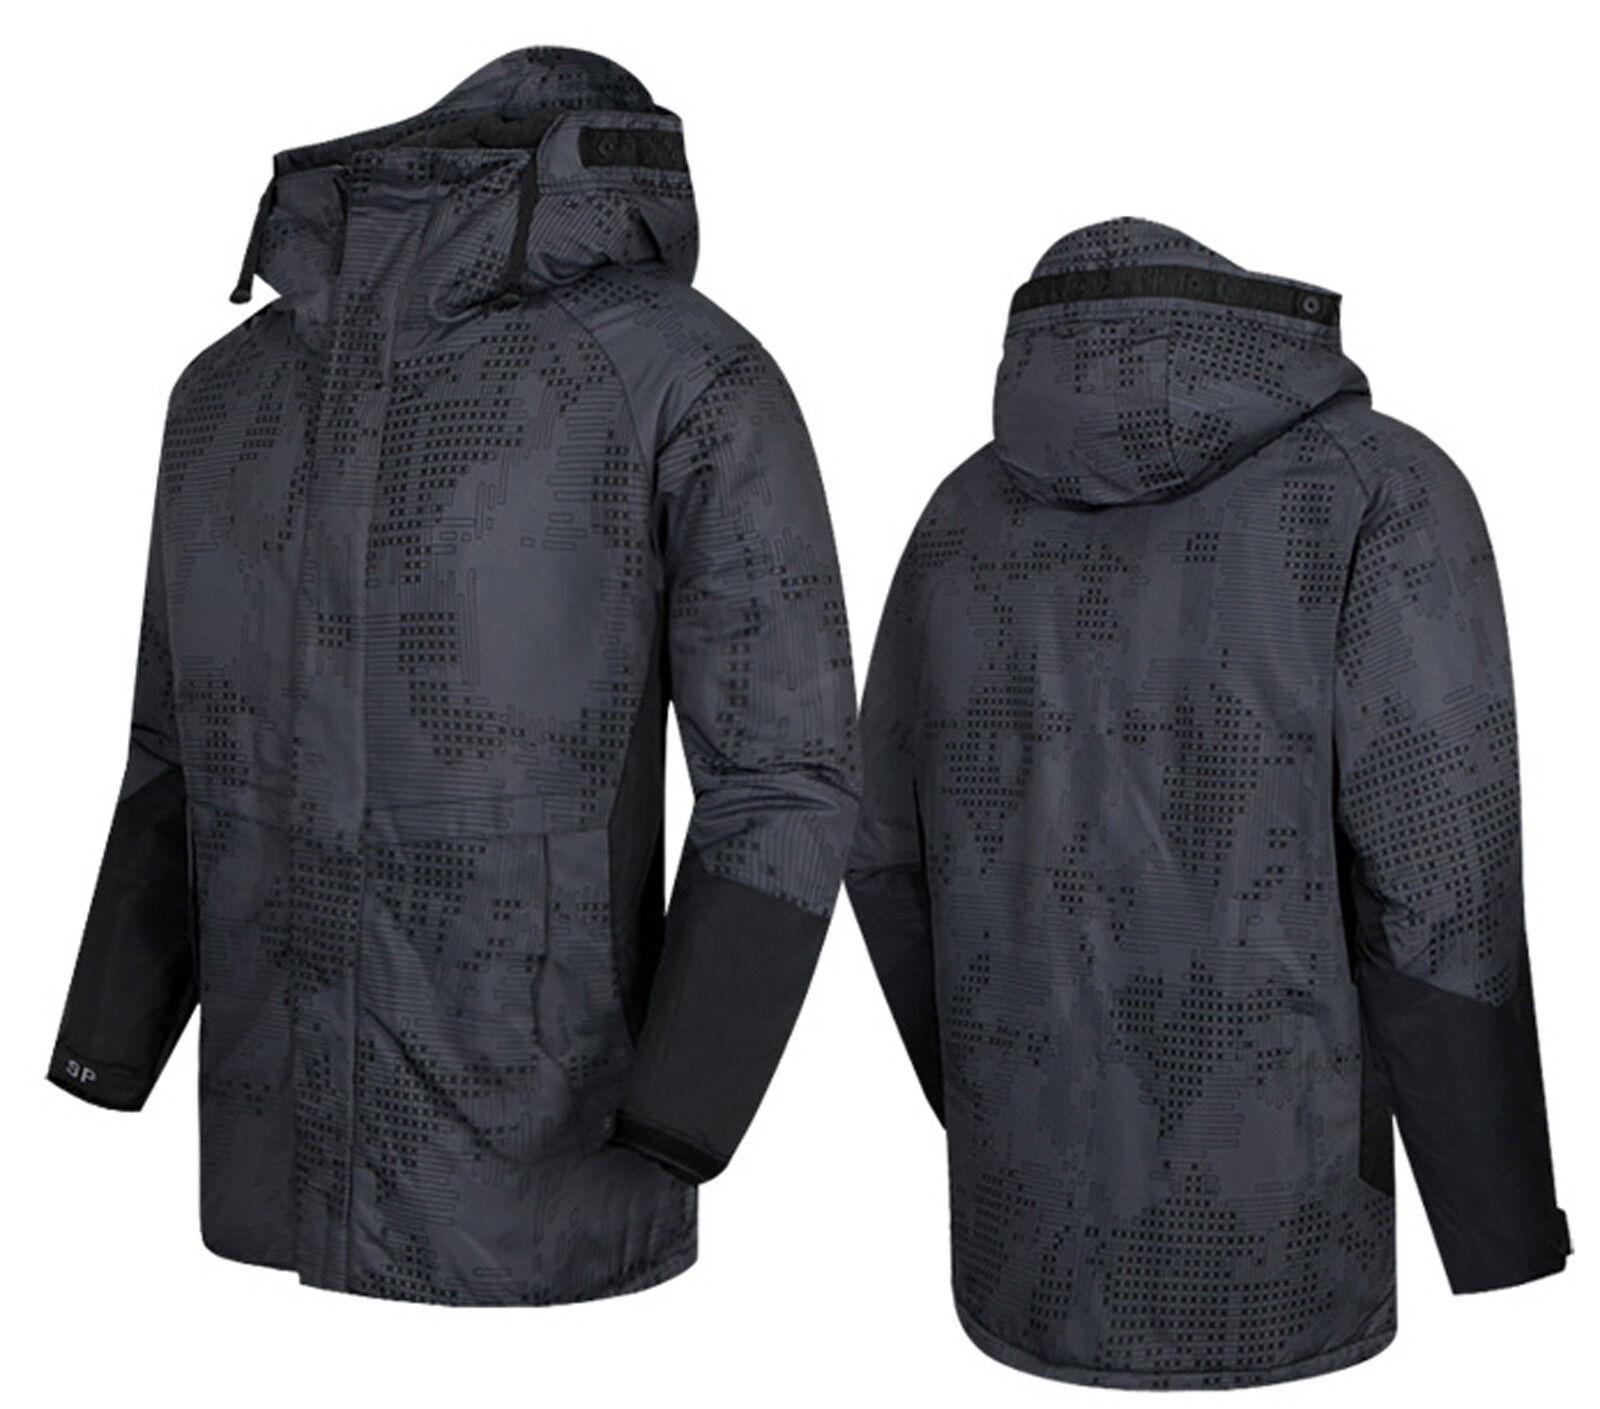 b097665a4c025 SouthPlay Winter Season Waterproof Warming Ski & Snowboard NAVY MILITARY  DARK npvdra4496-Jackets